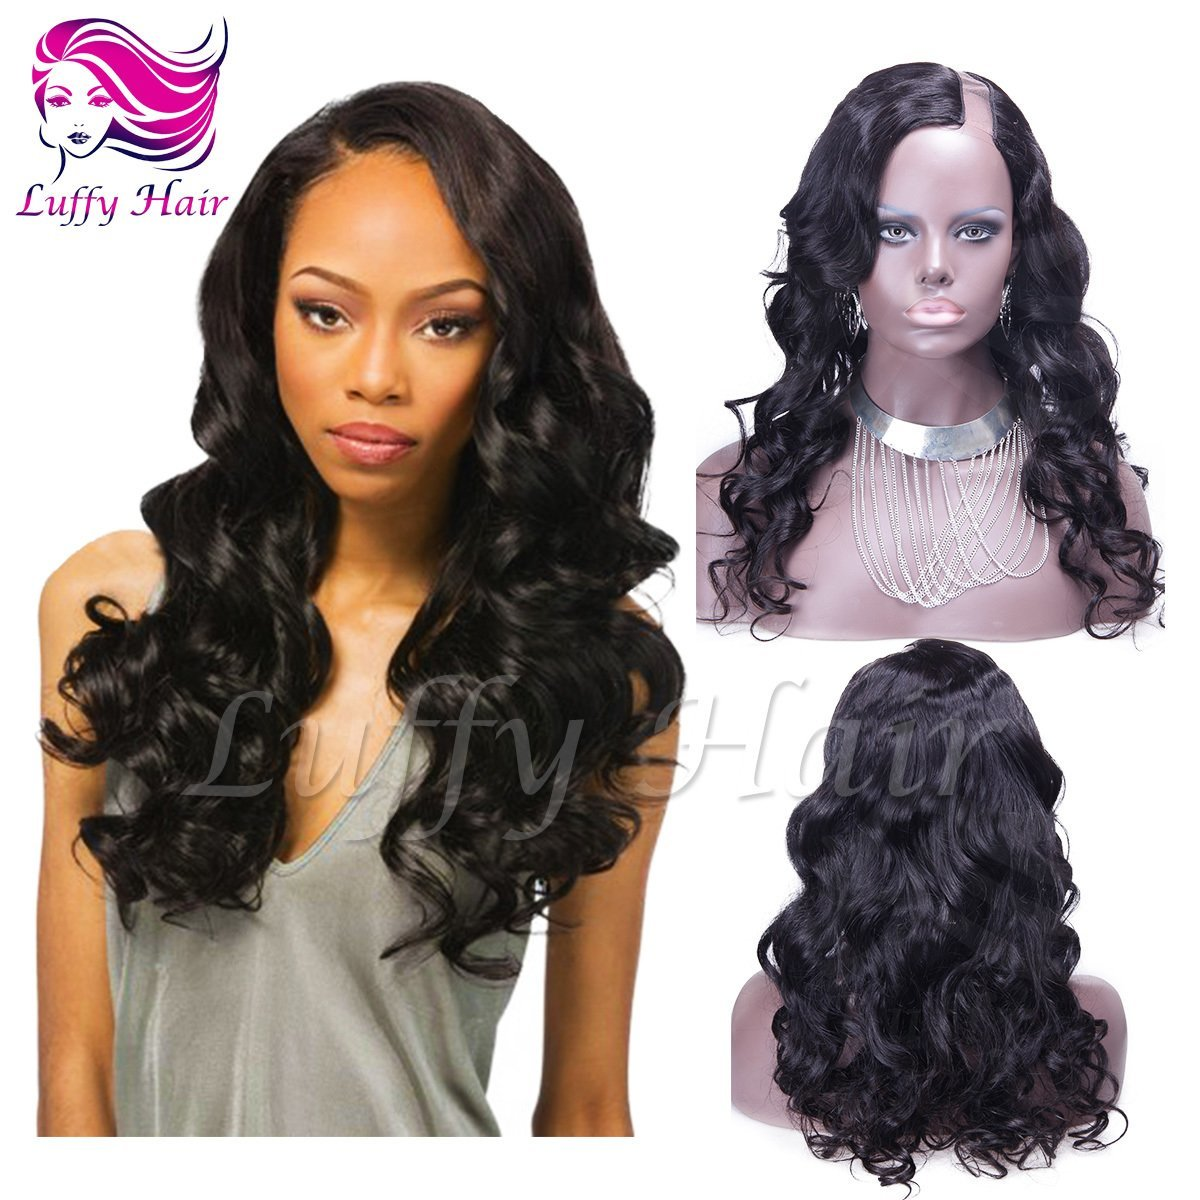 8A Virgin Human Hair Body Wave U Part Wig - KWU005